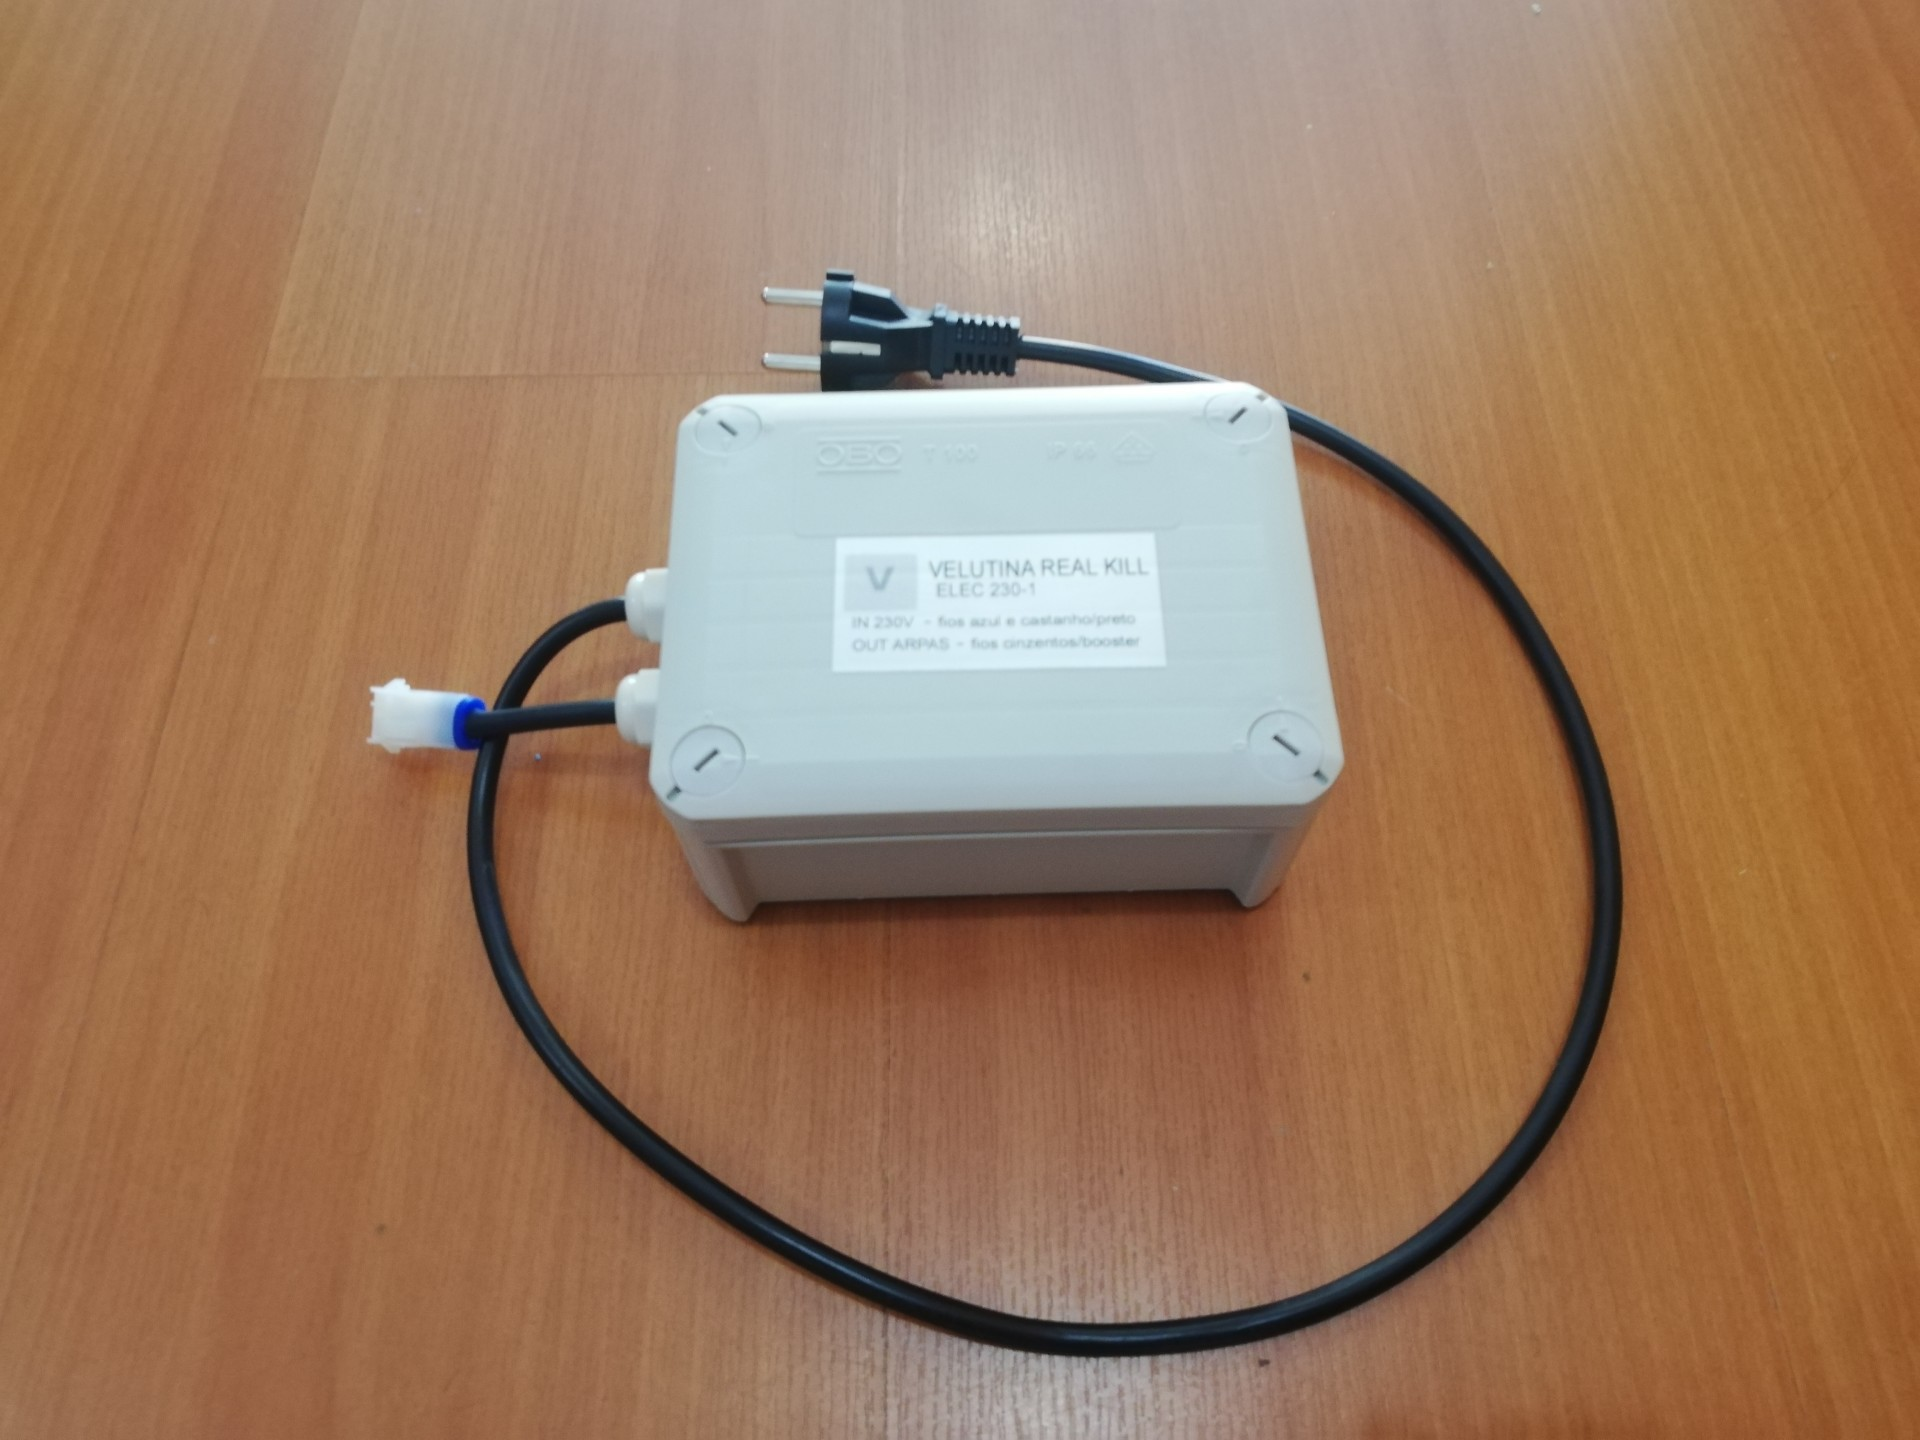 Kit Electrónico Velutina 230VAC (alimentação rede eléctrica)